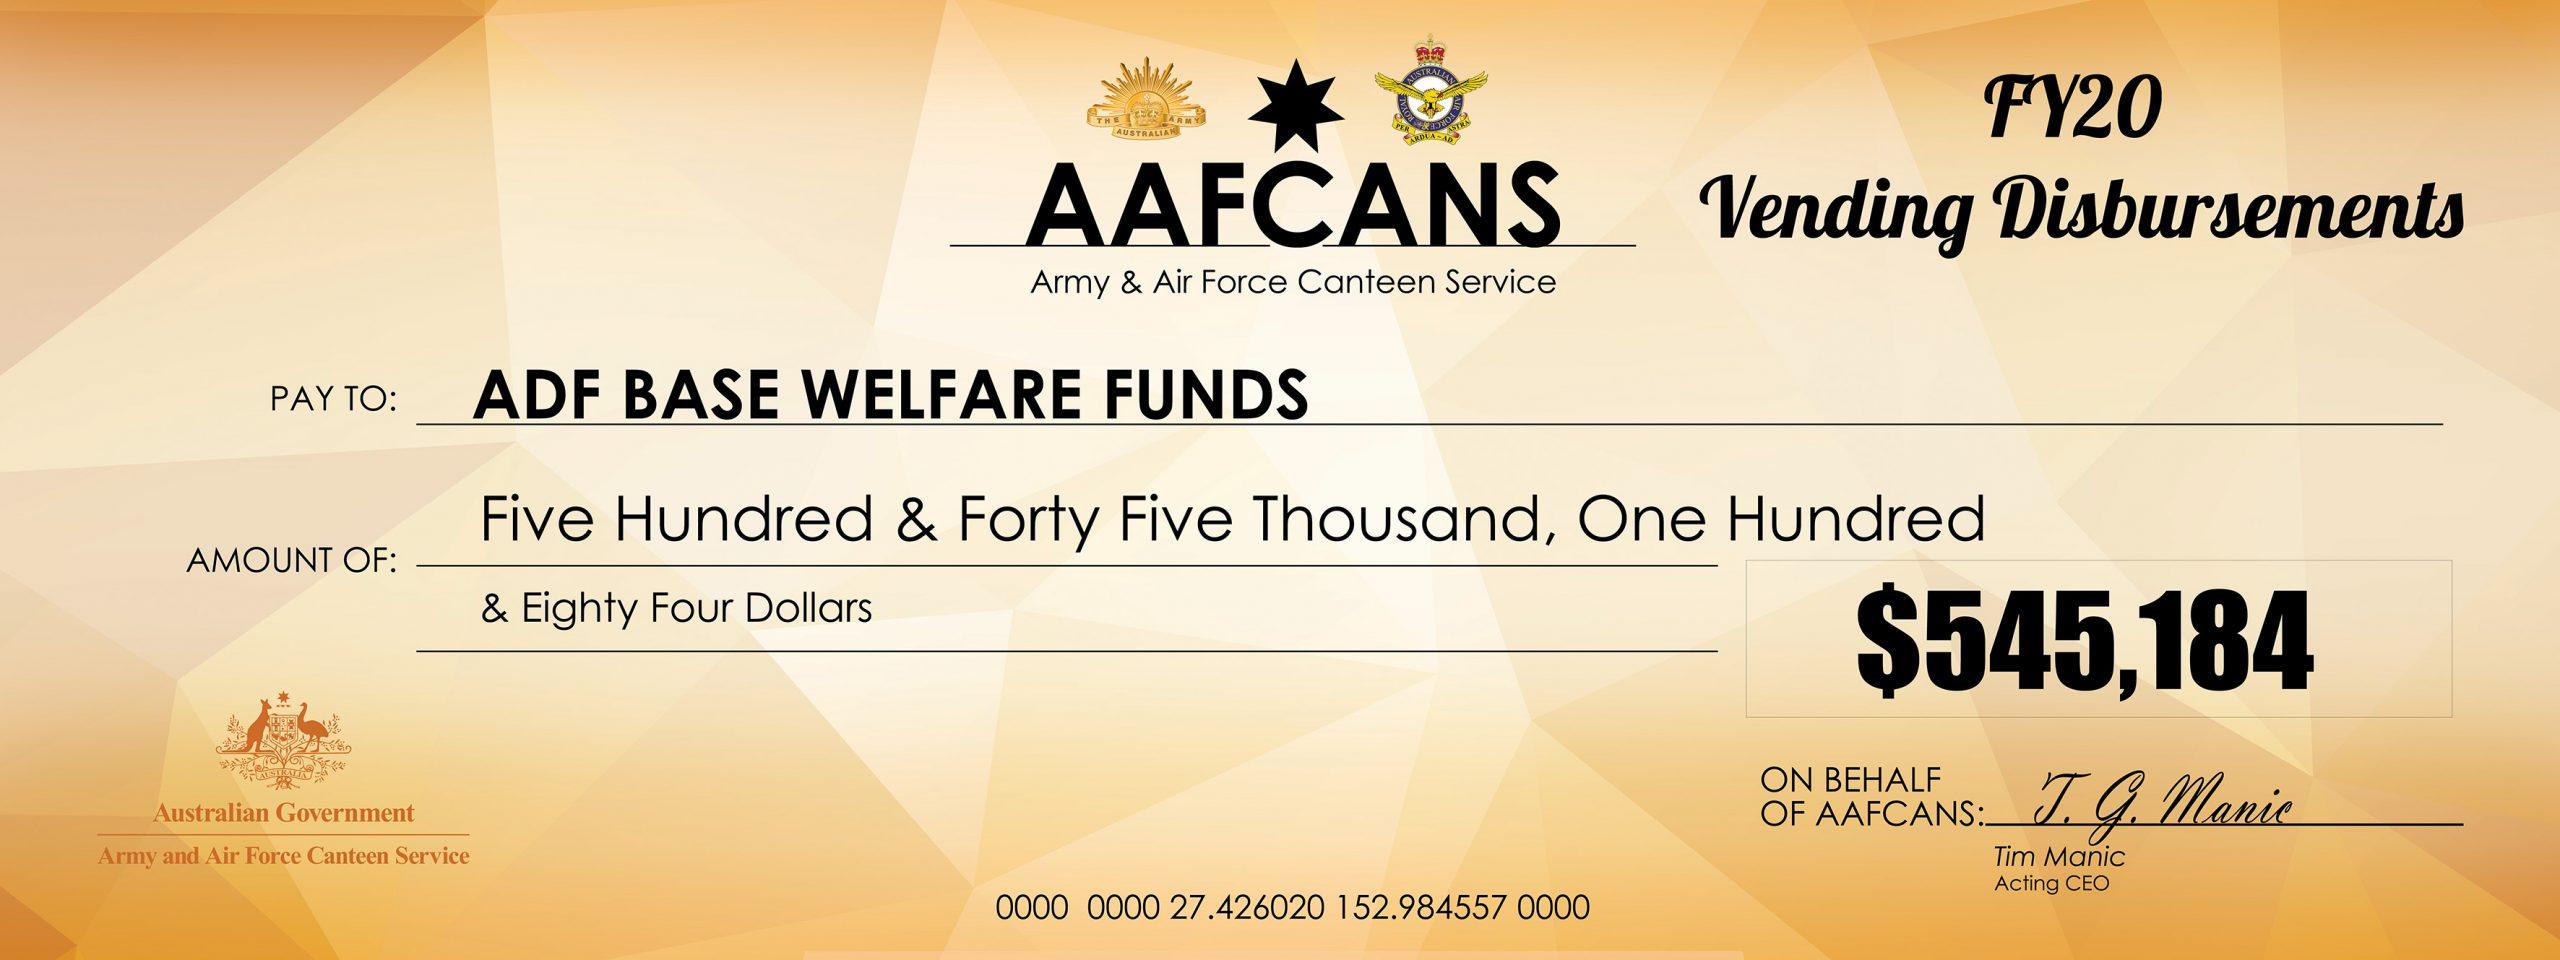 Welfare Disbursements 2020